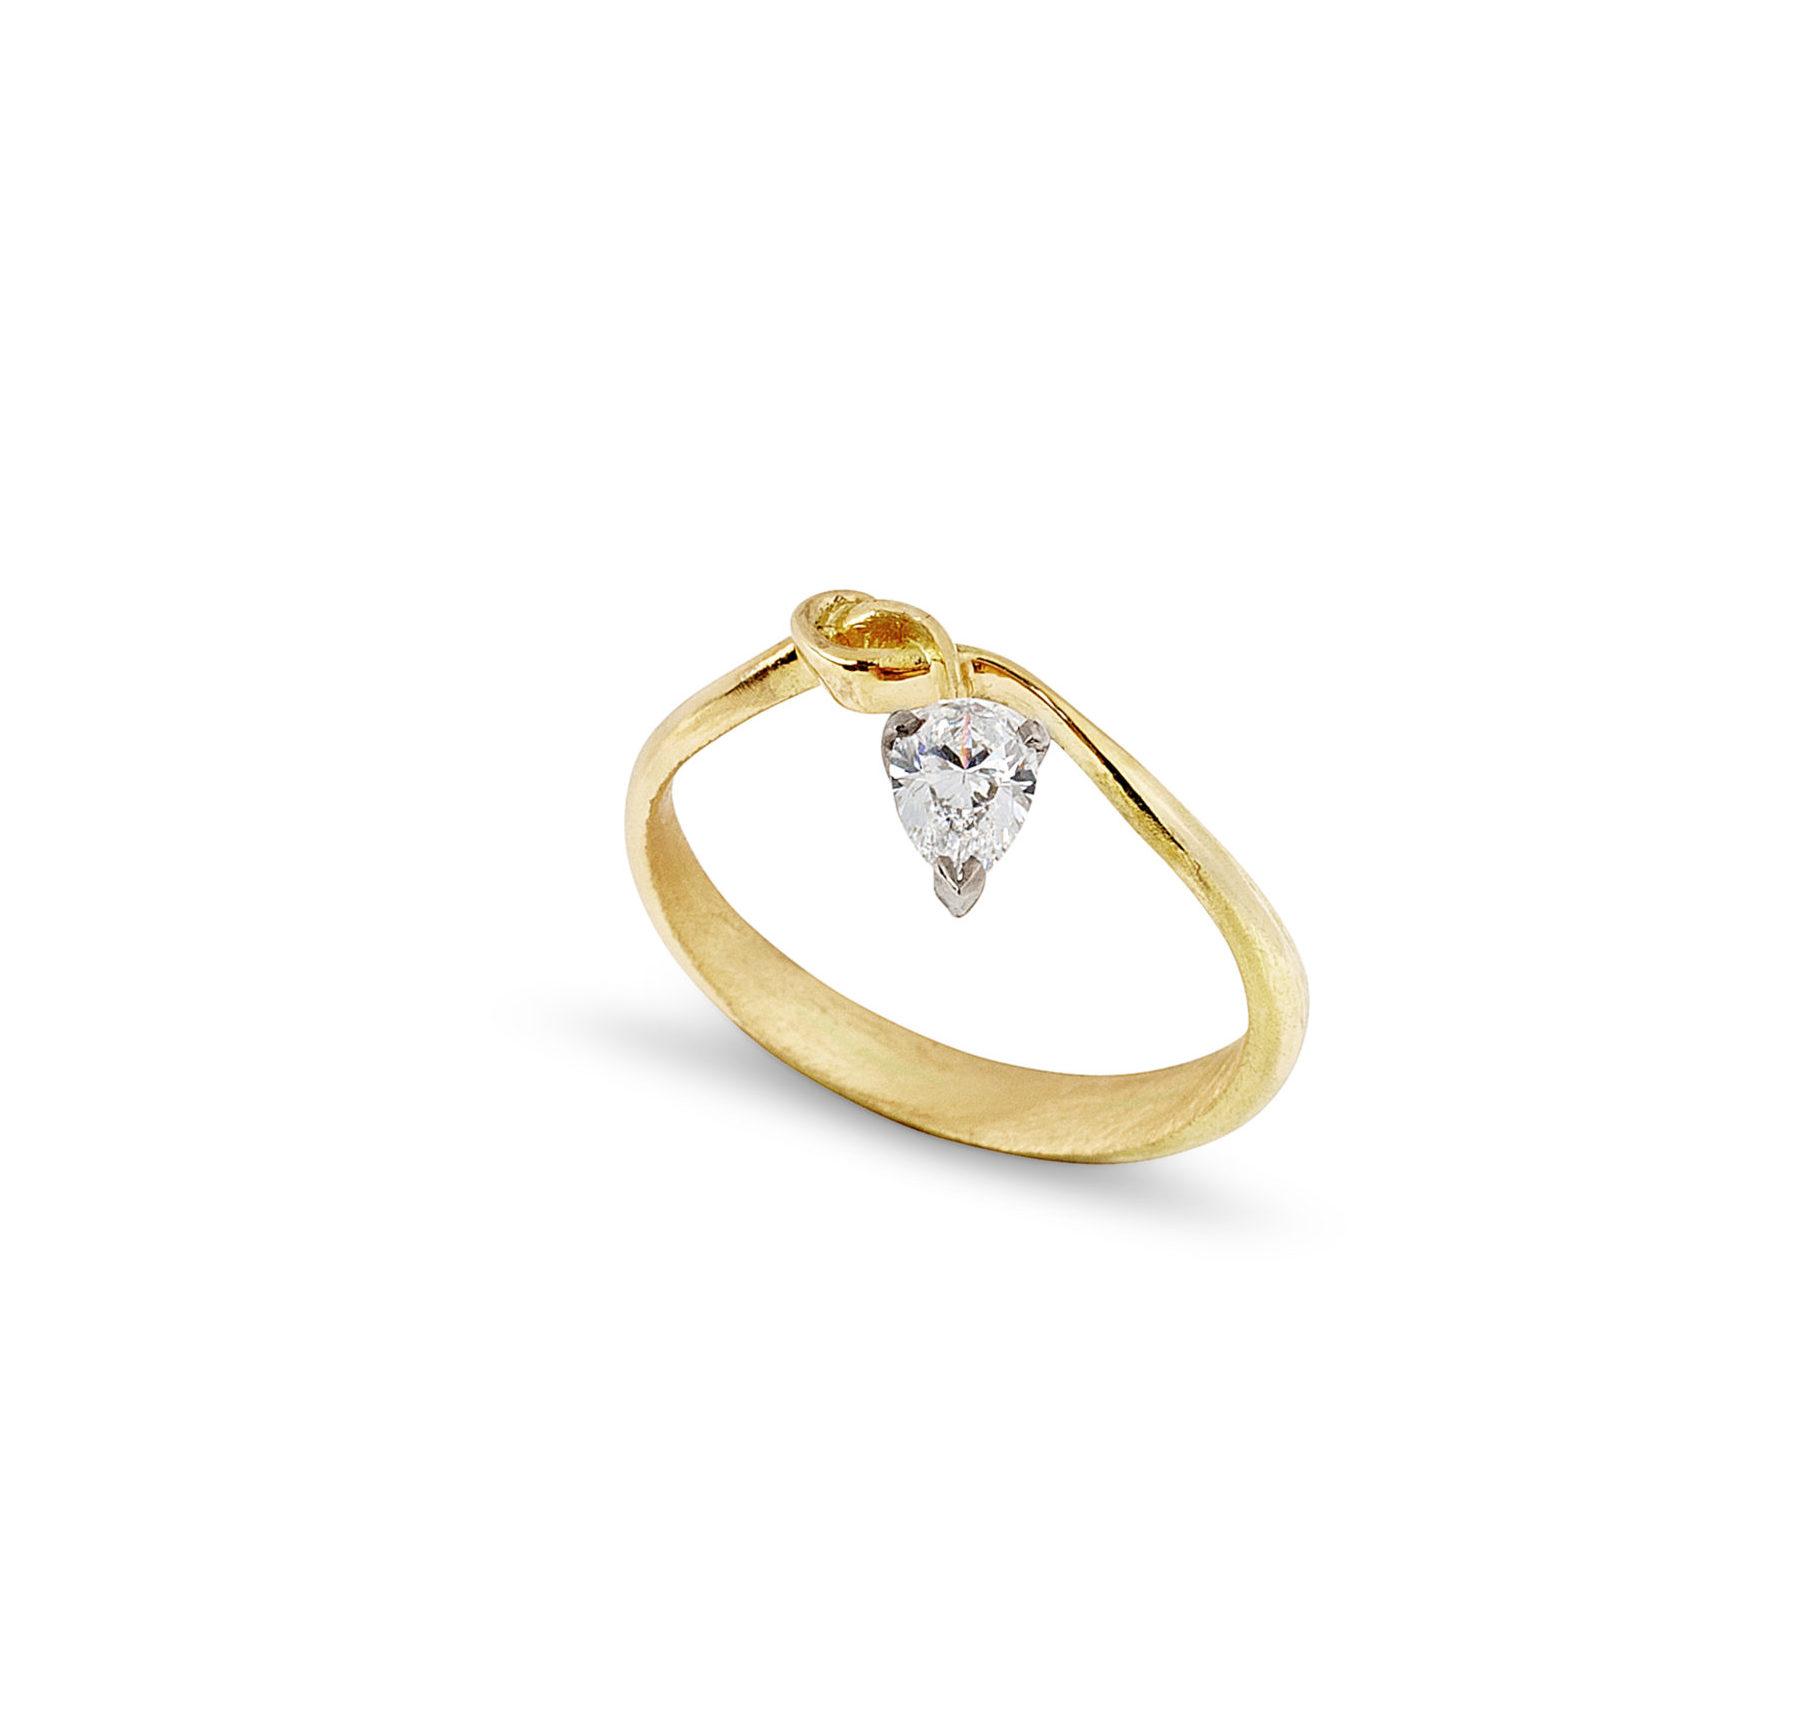 Jessie-Thomas-18ct-yellow-gold-diamond-ring-alternative-engagement